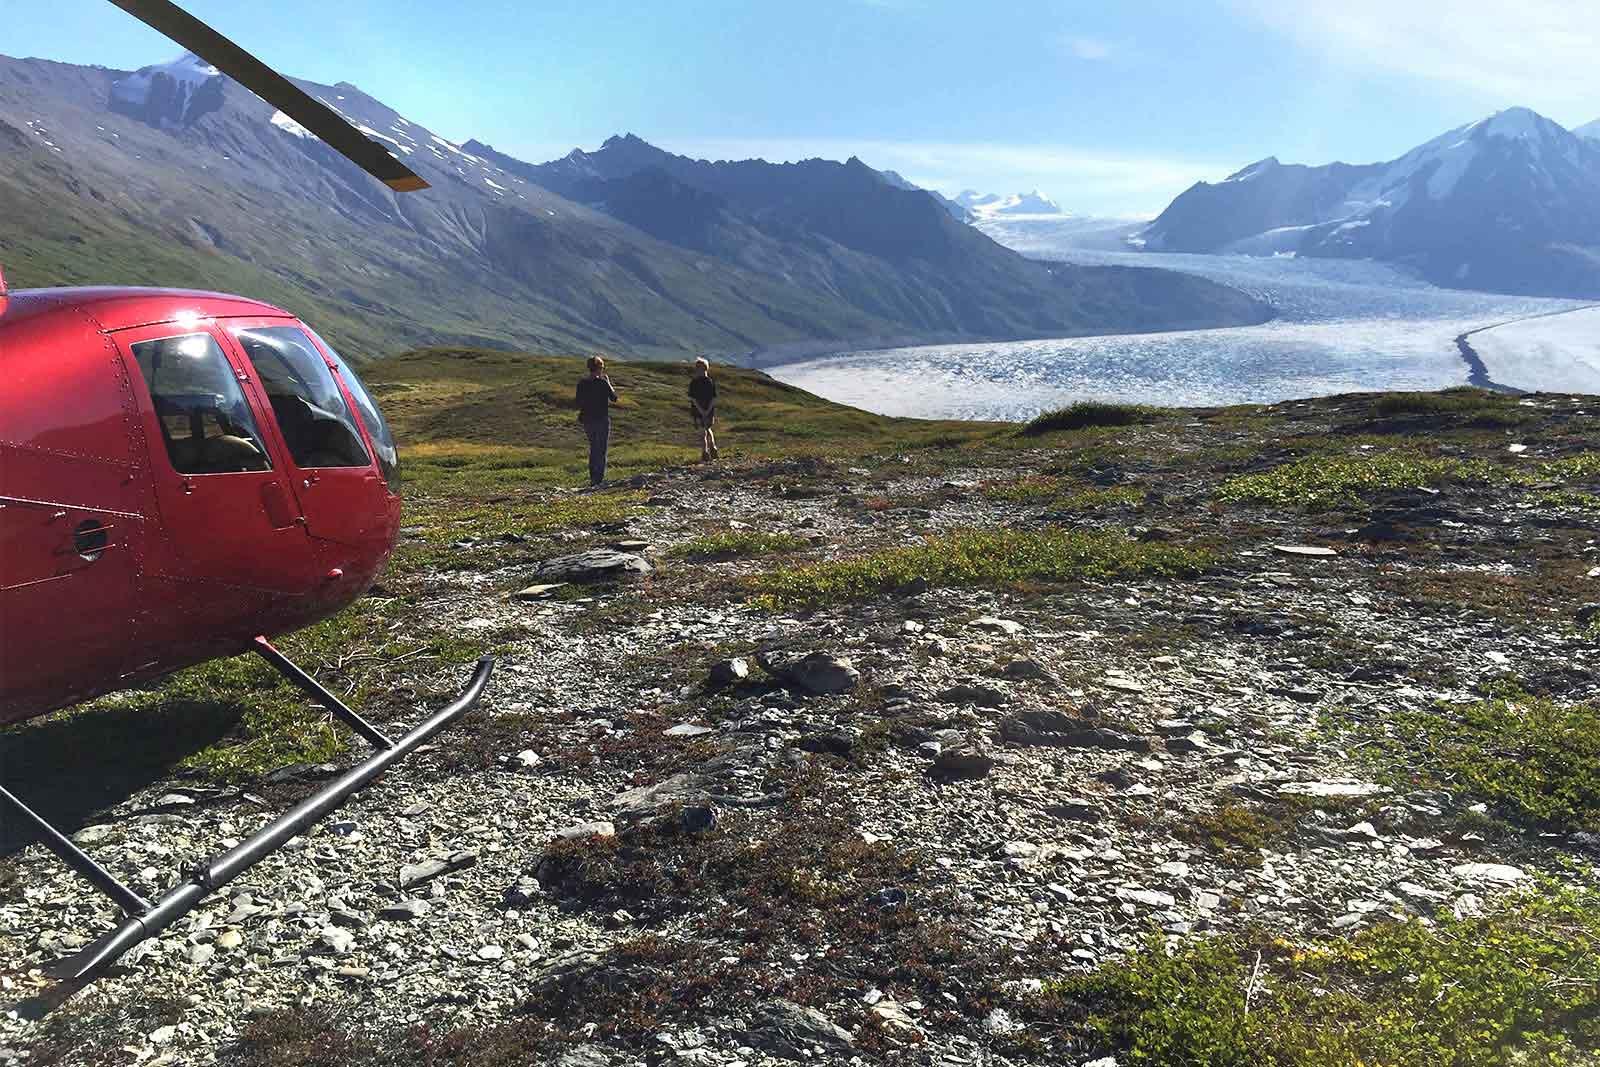 Alaska Glacier Heli Hiking